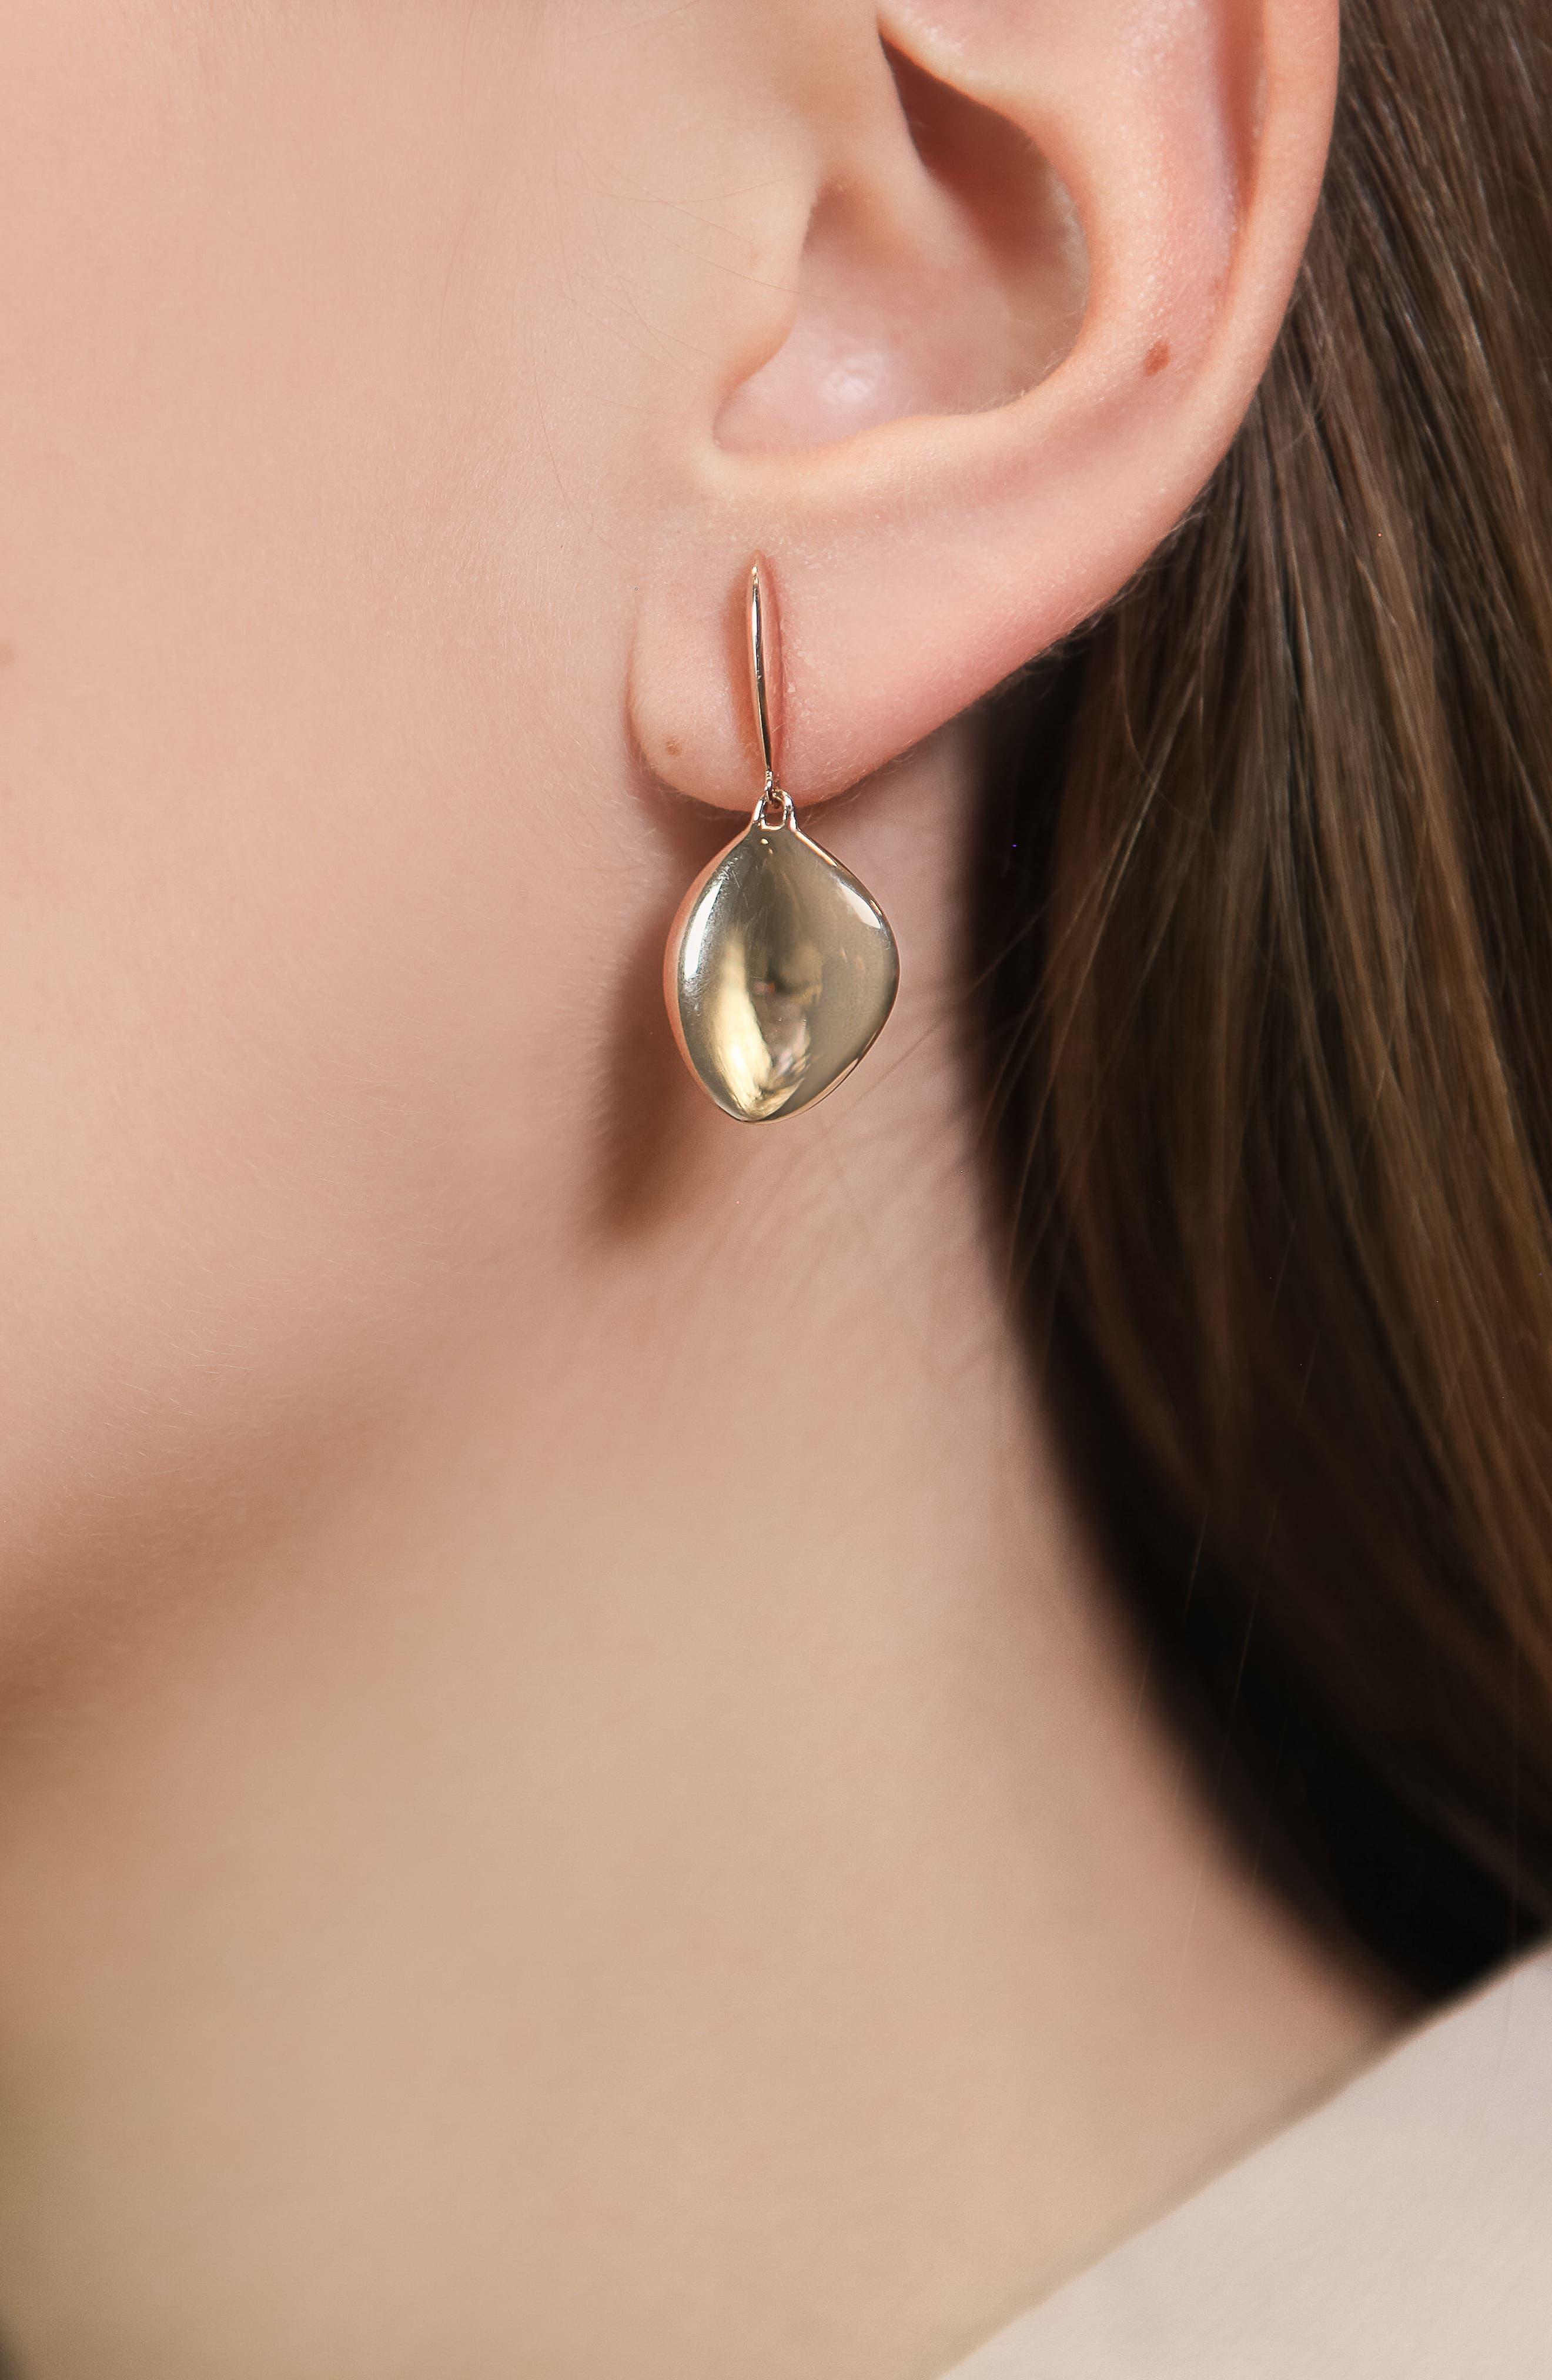 Engravable Nura Vermeil Teardrop Earrings,                             Alternate thumbnail 4, color,                             ROSE GOLD